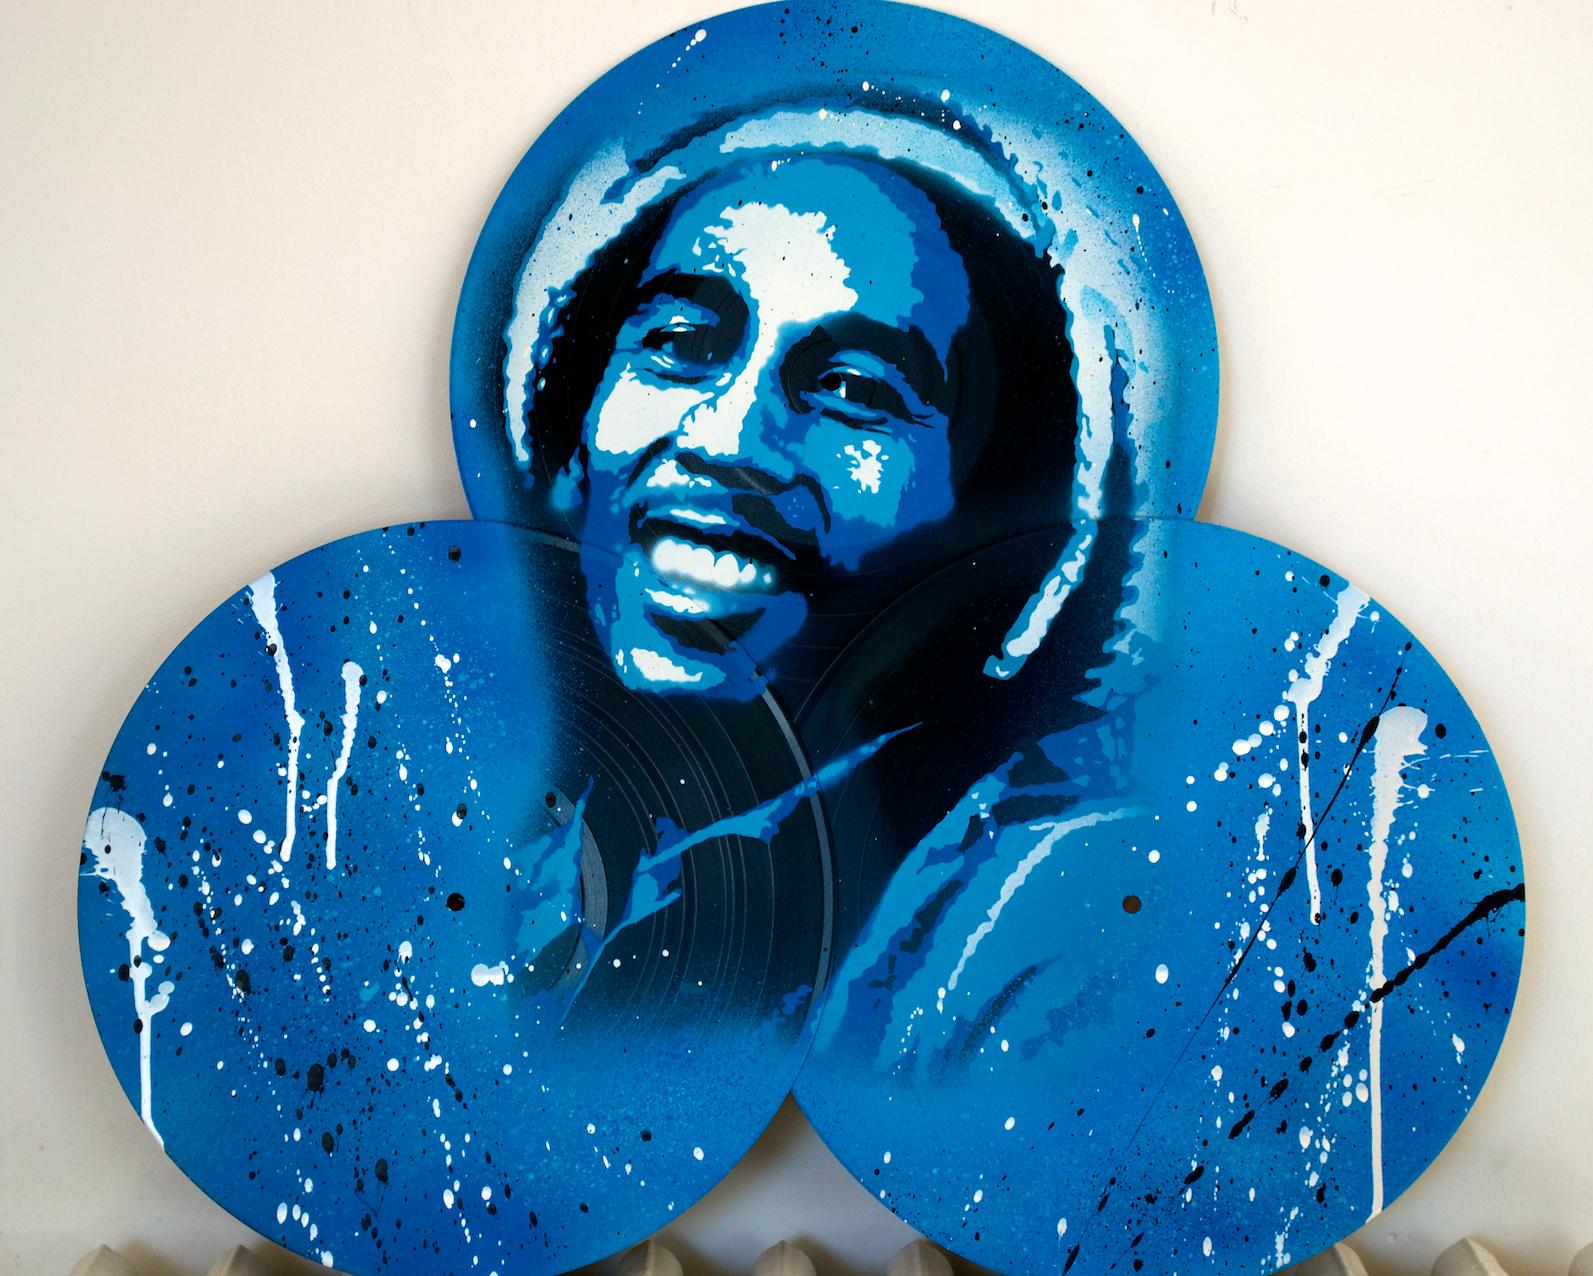 Marley2.jpg